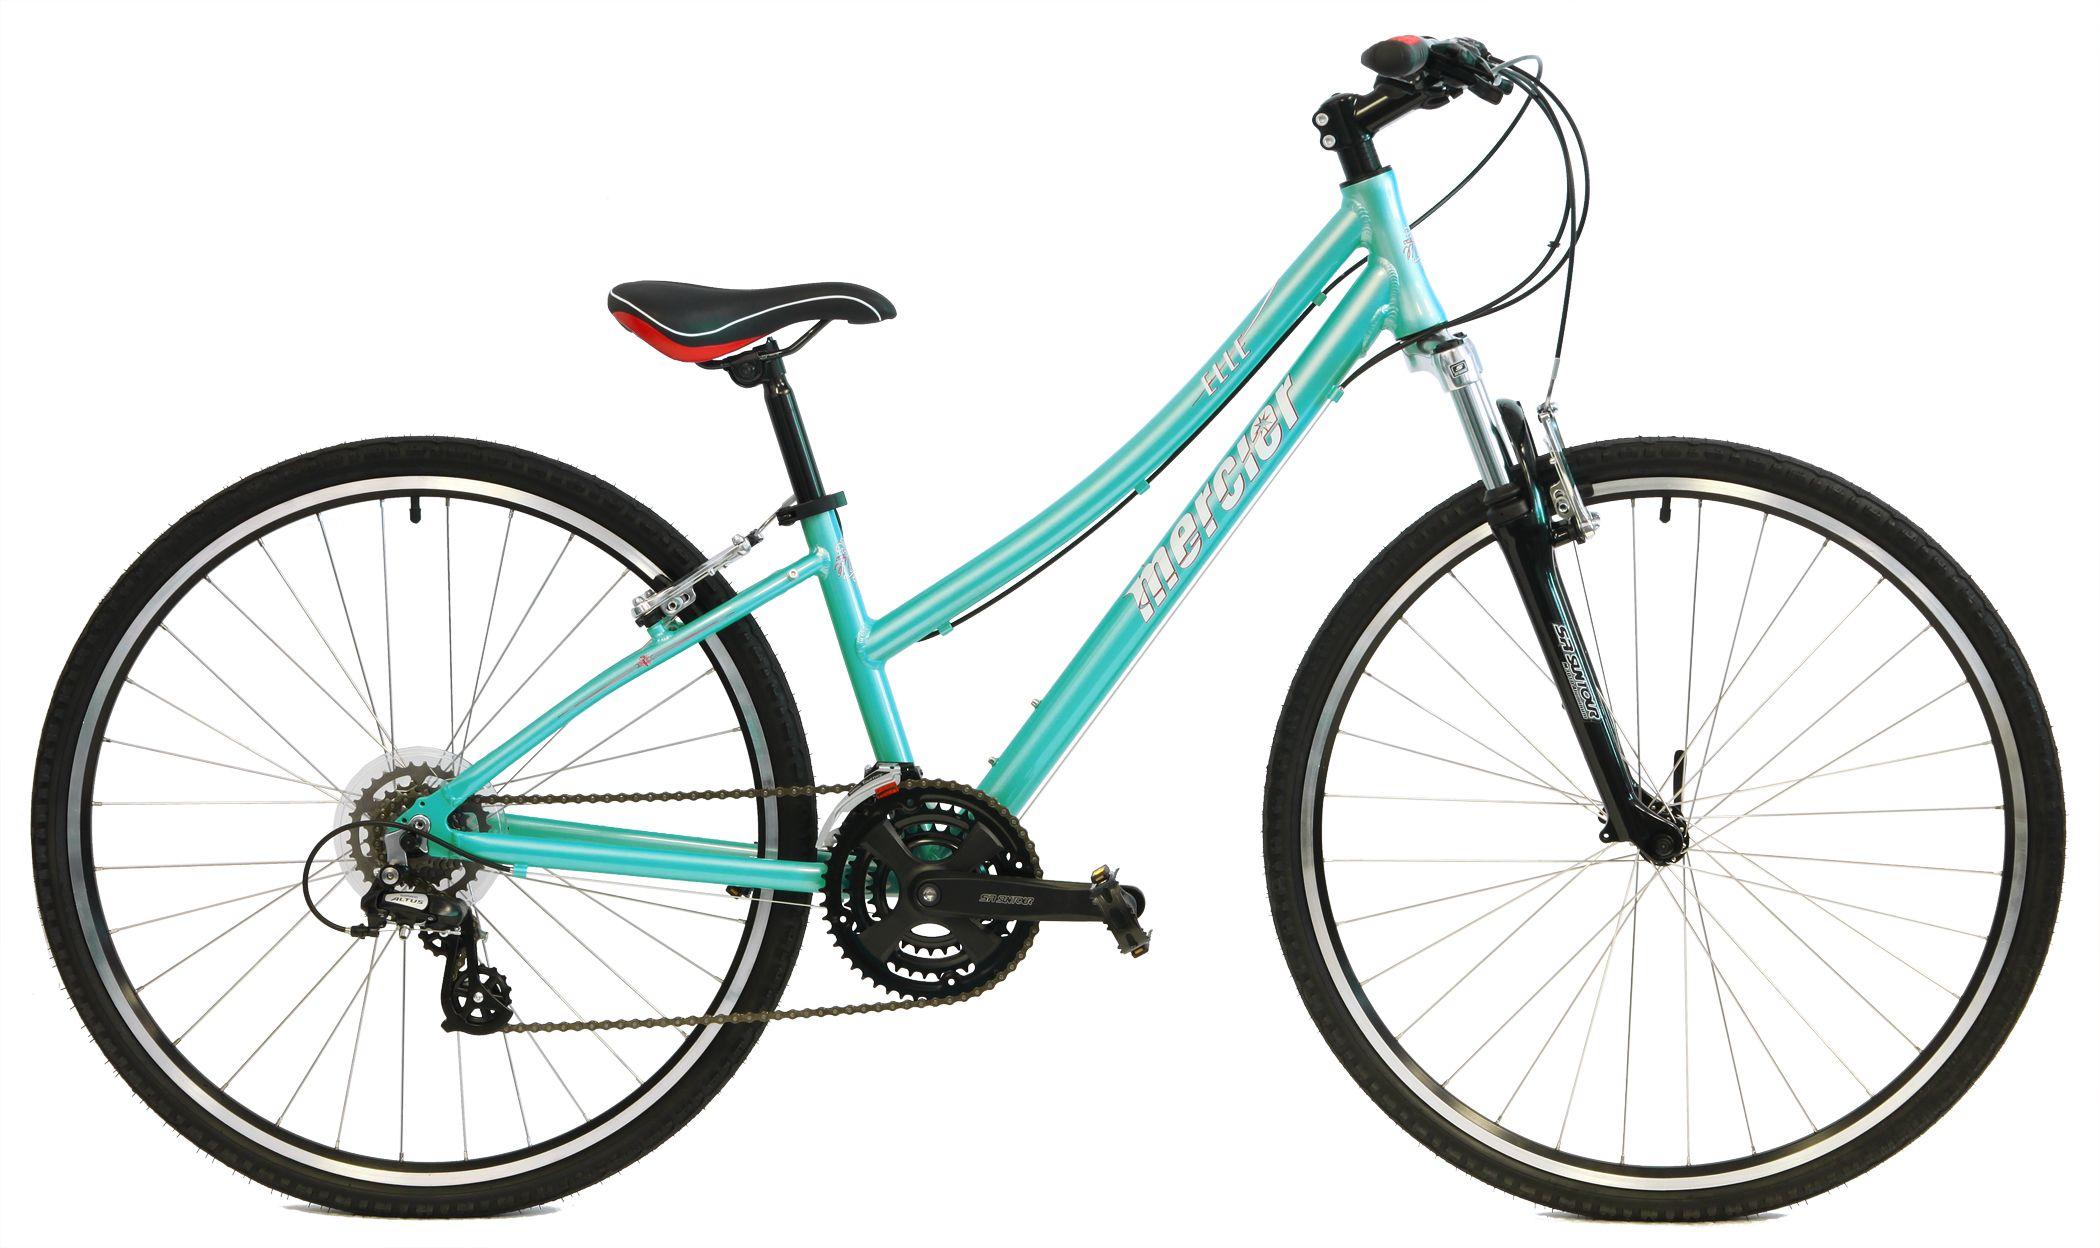 Mercier Adventure Hybrid Bikes 29er Bicycles Hybrid Bike Hybrid Bicycle Bike